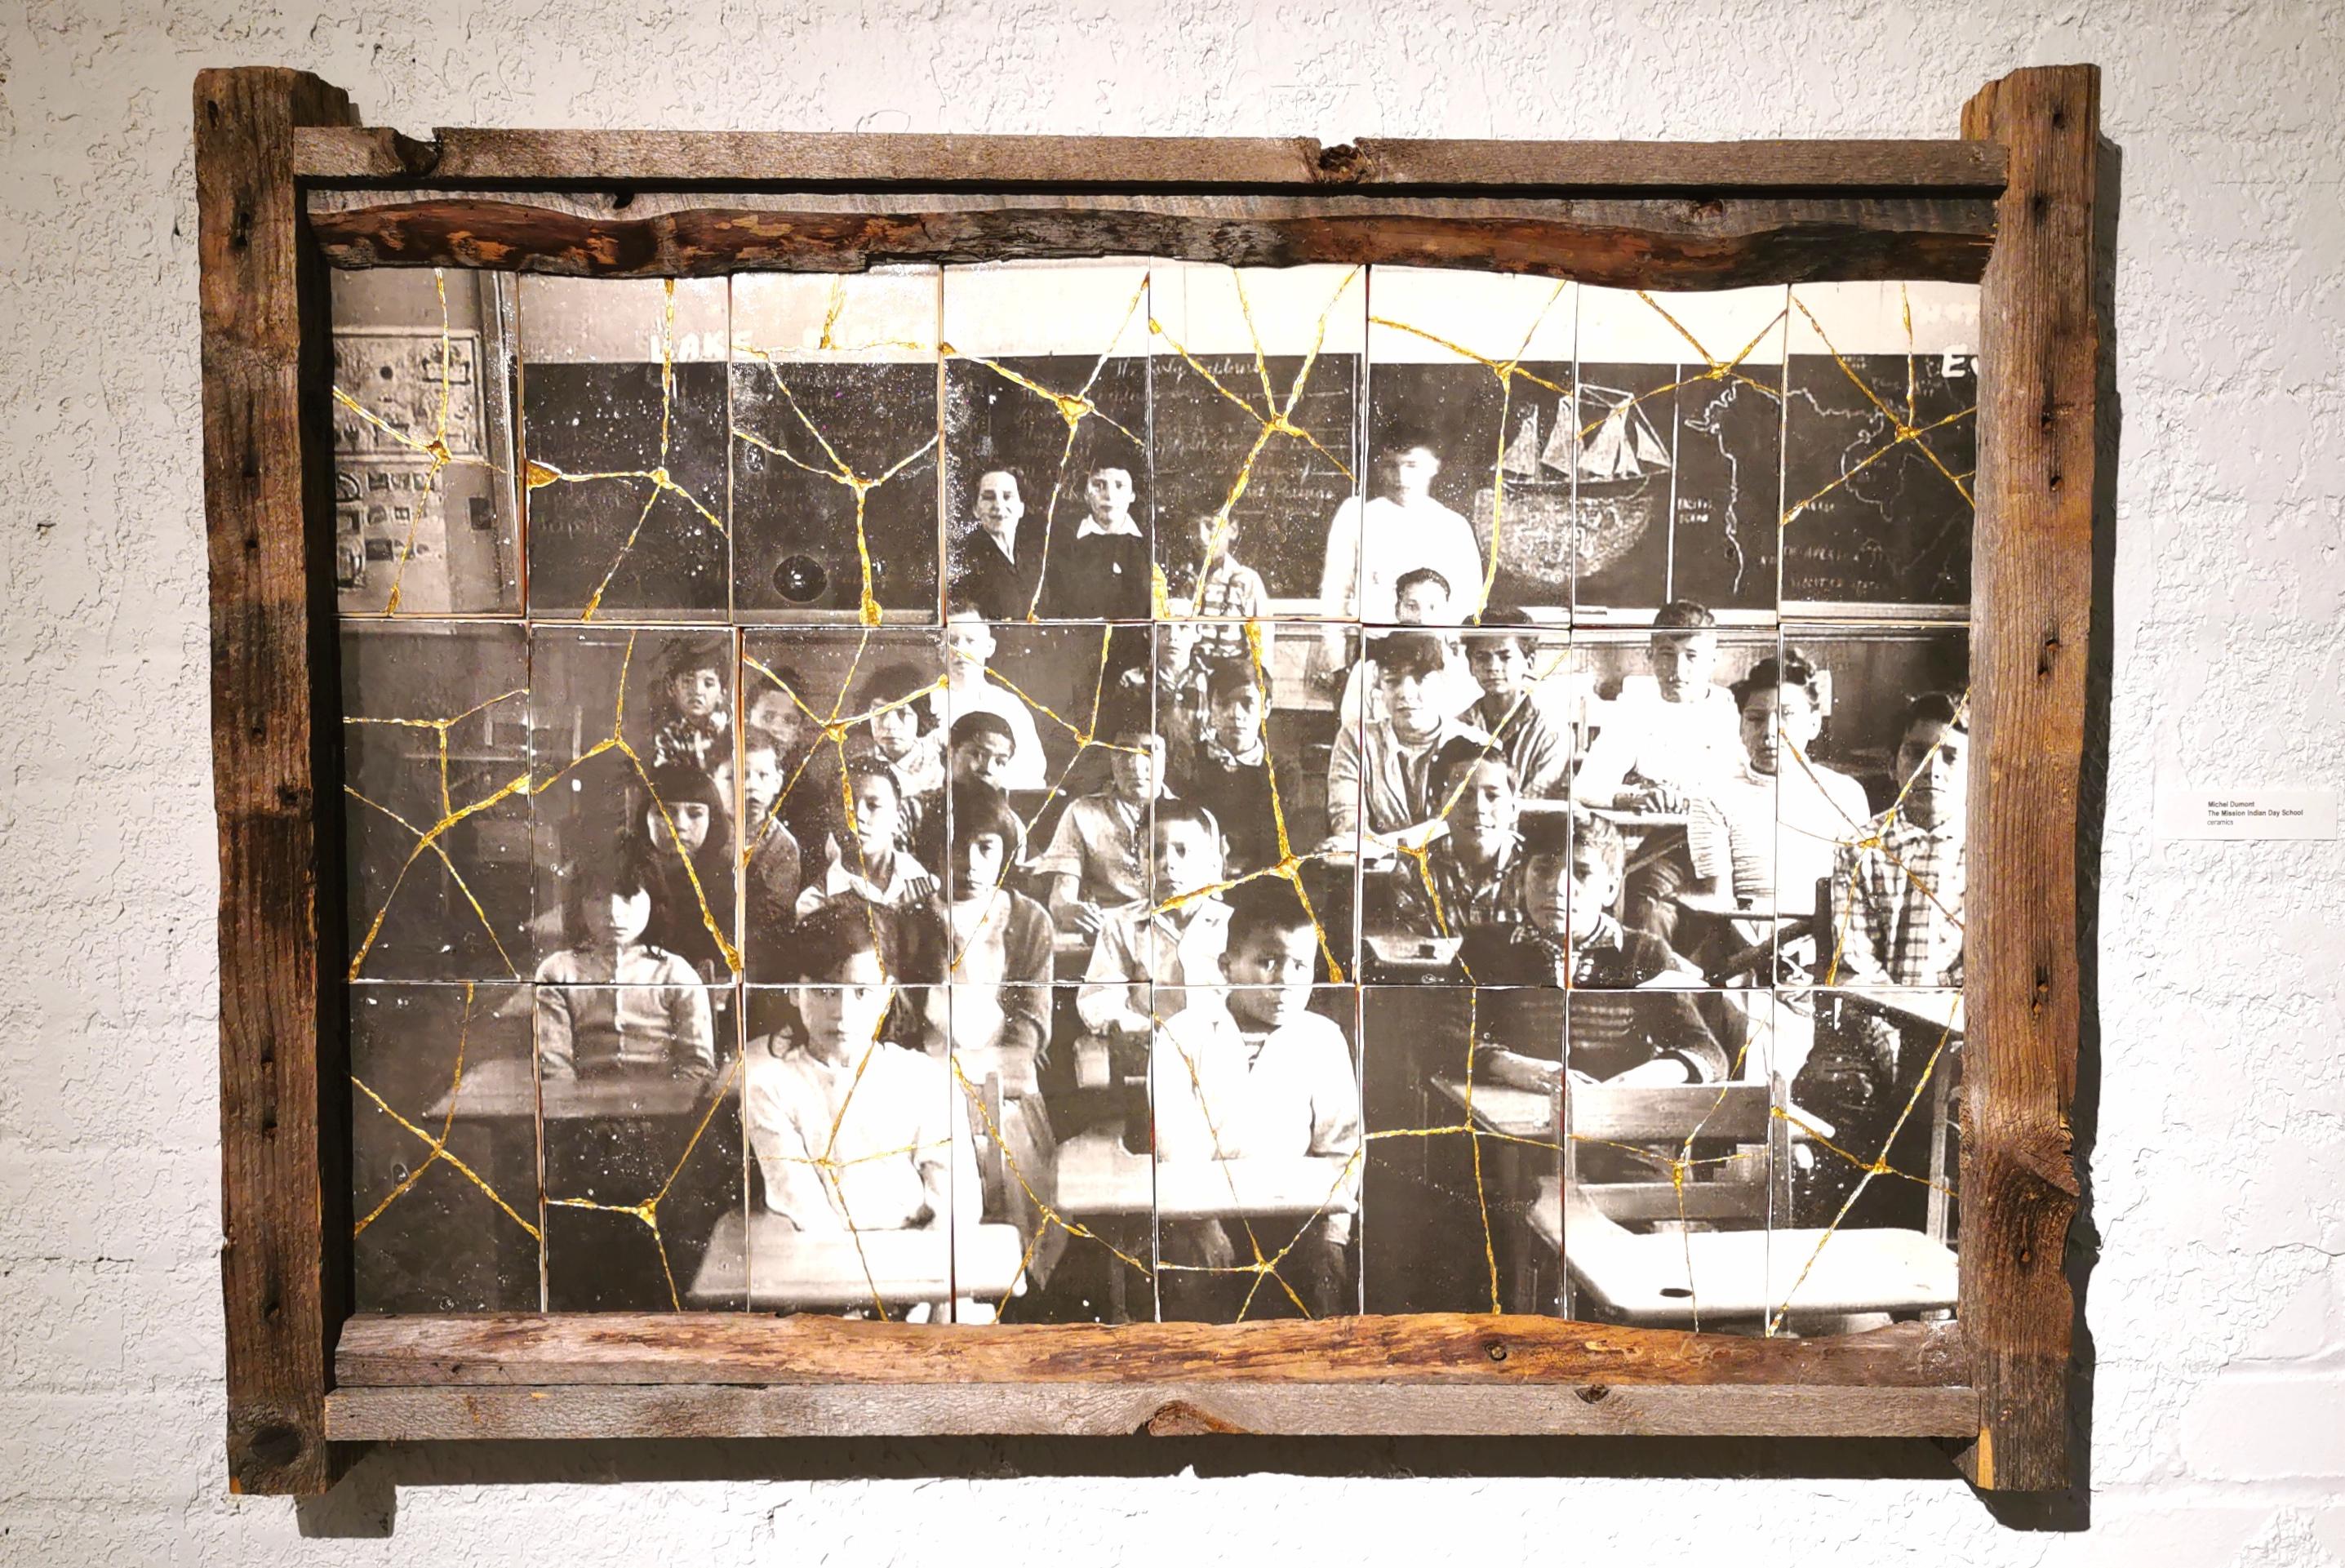 a mosaic made up of up photographs